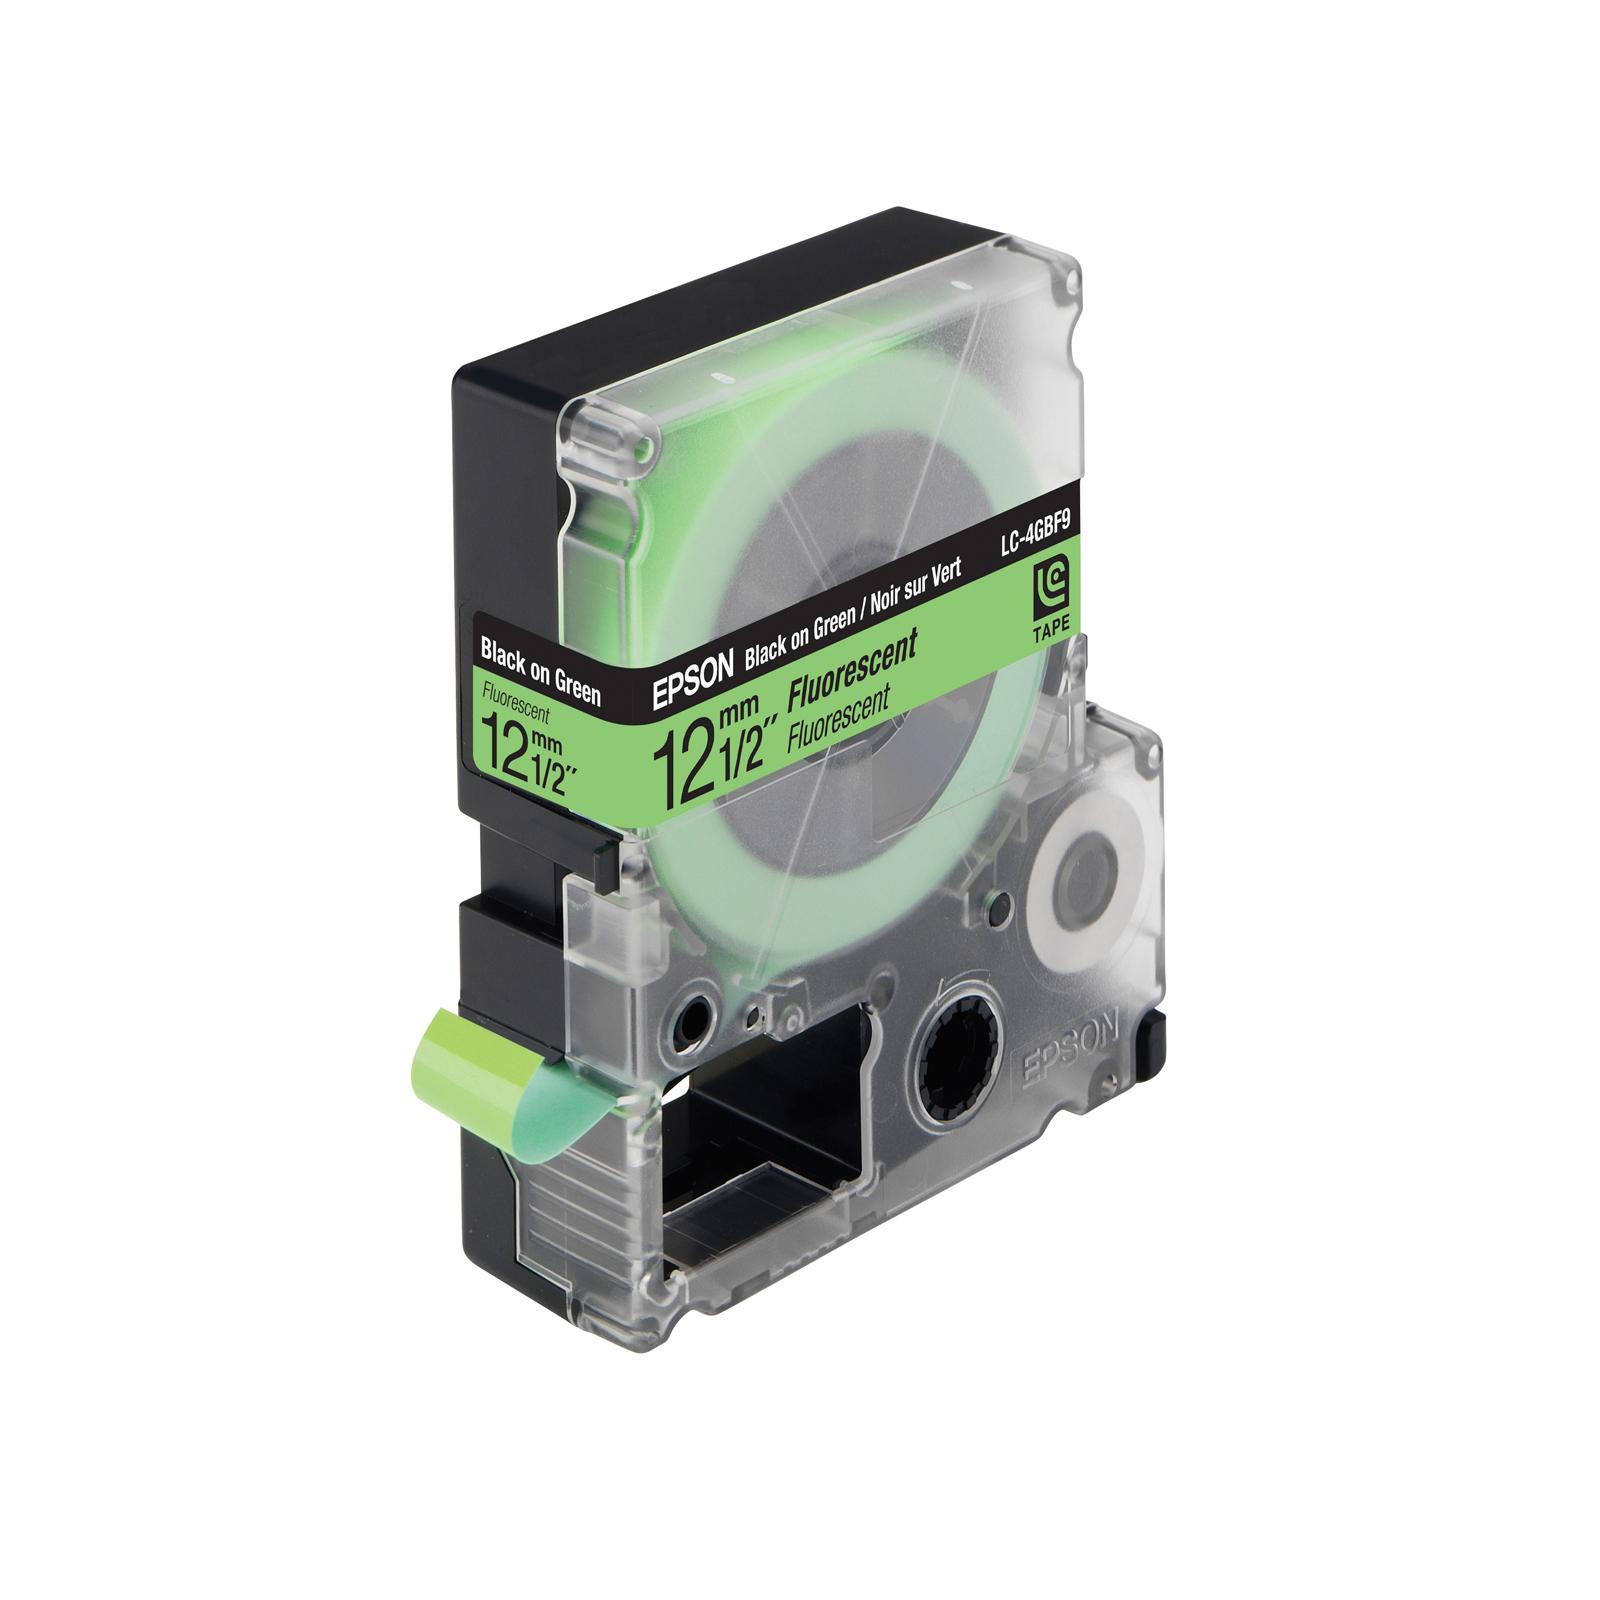 Лента для принтера этикеток EPSON Labelworks LC-4GBF9 (C53S625413)